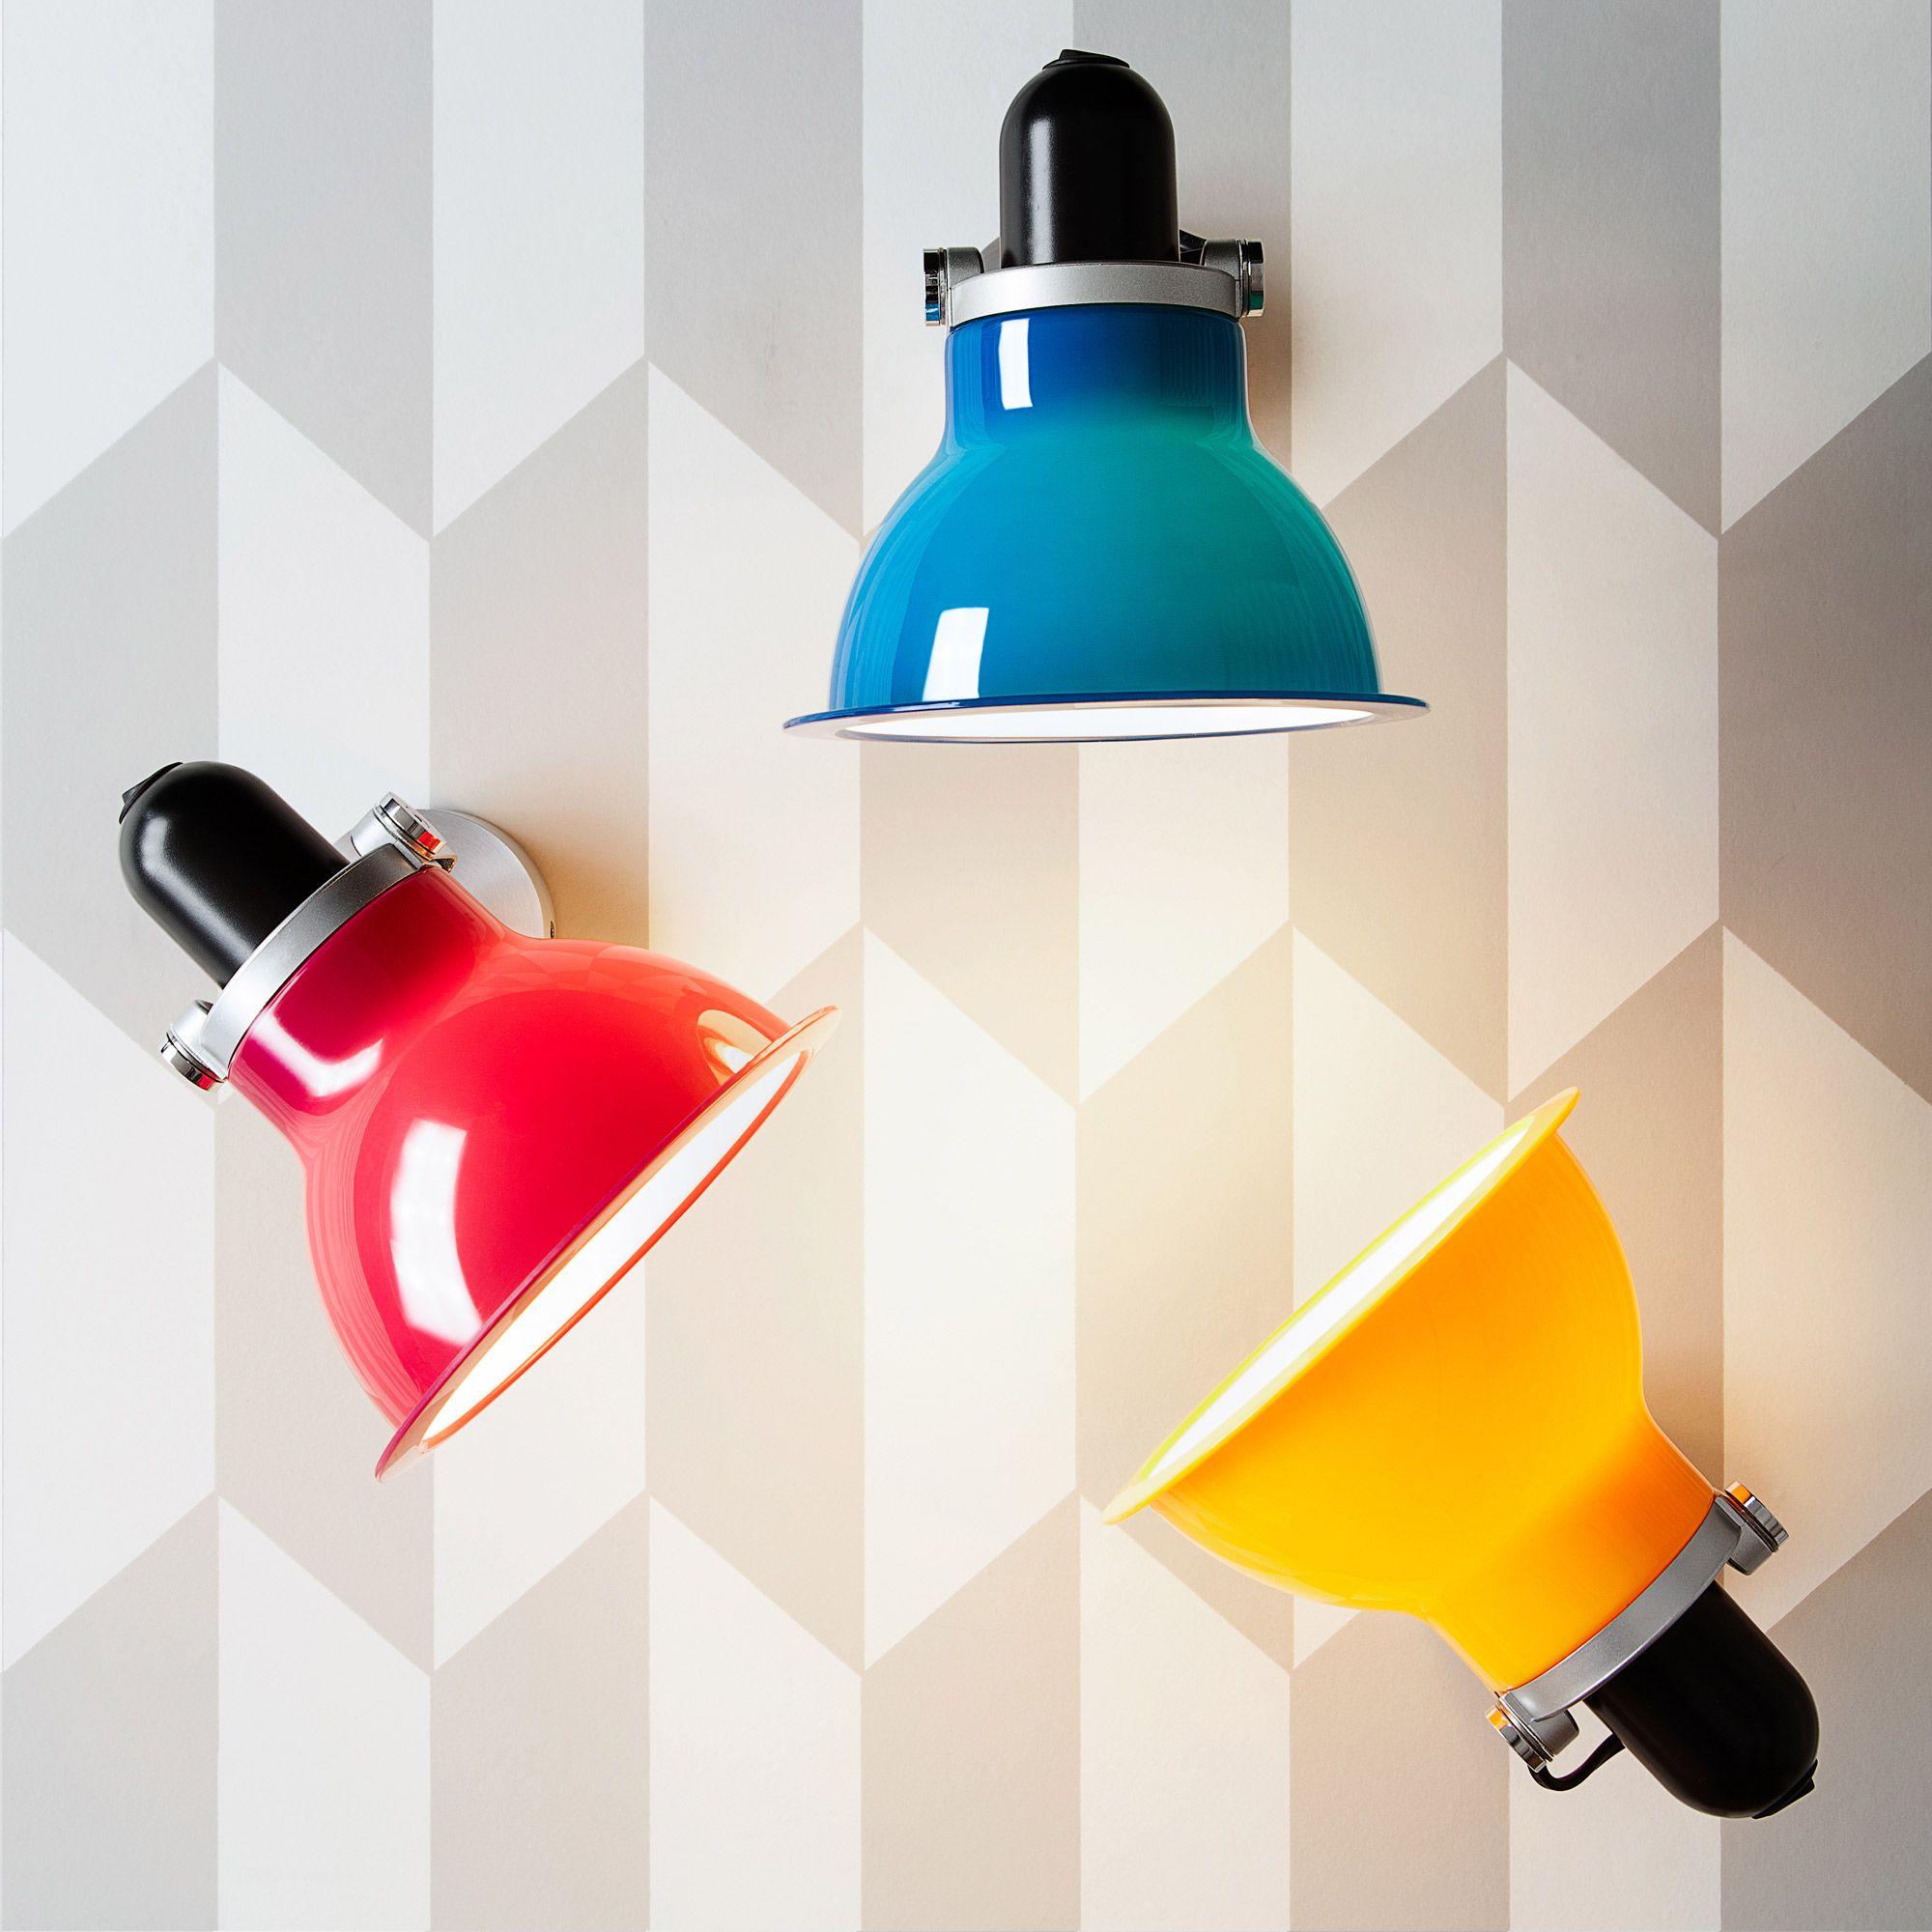 Pin by lightonline on lampe en couleurs pinterest anglepoise